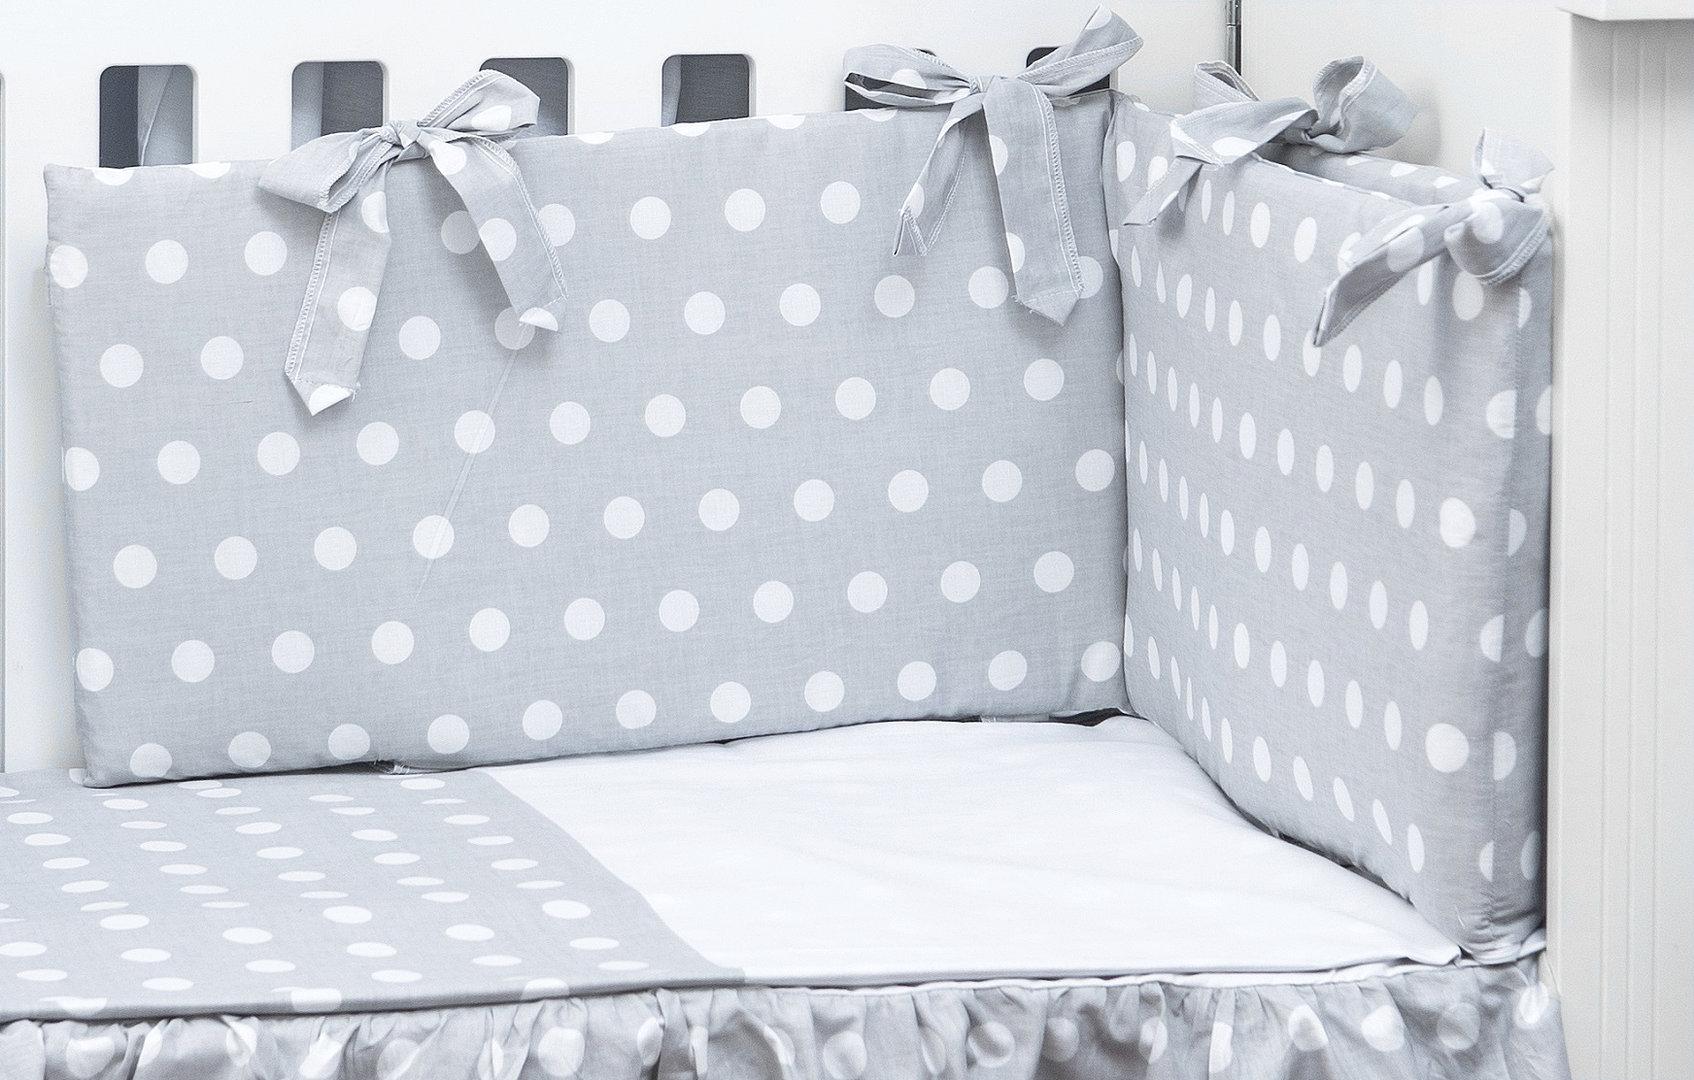 Funda Nordica One Piece.Cot Bumper And Duvet Cover 3 Pieces Set Polka Dots Collection White Grey Vizaro